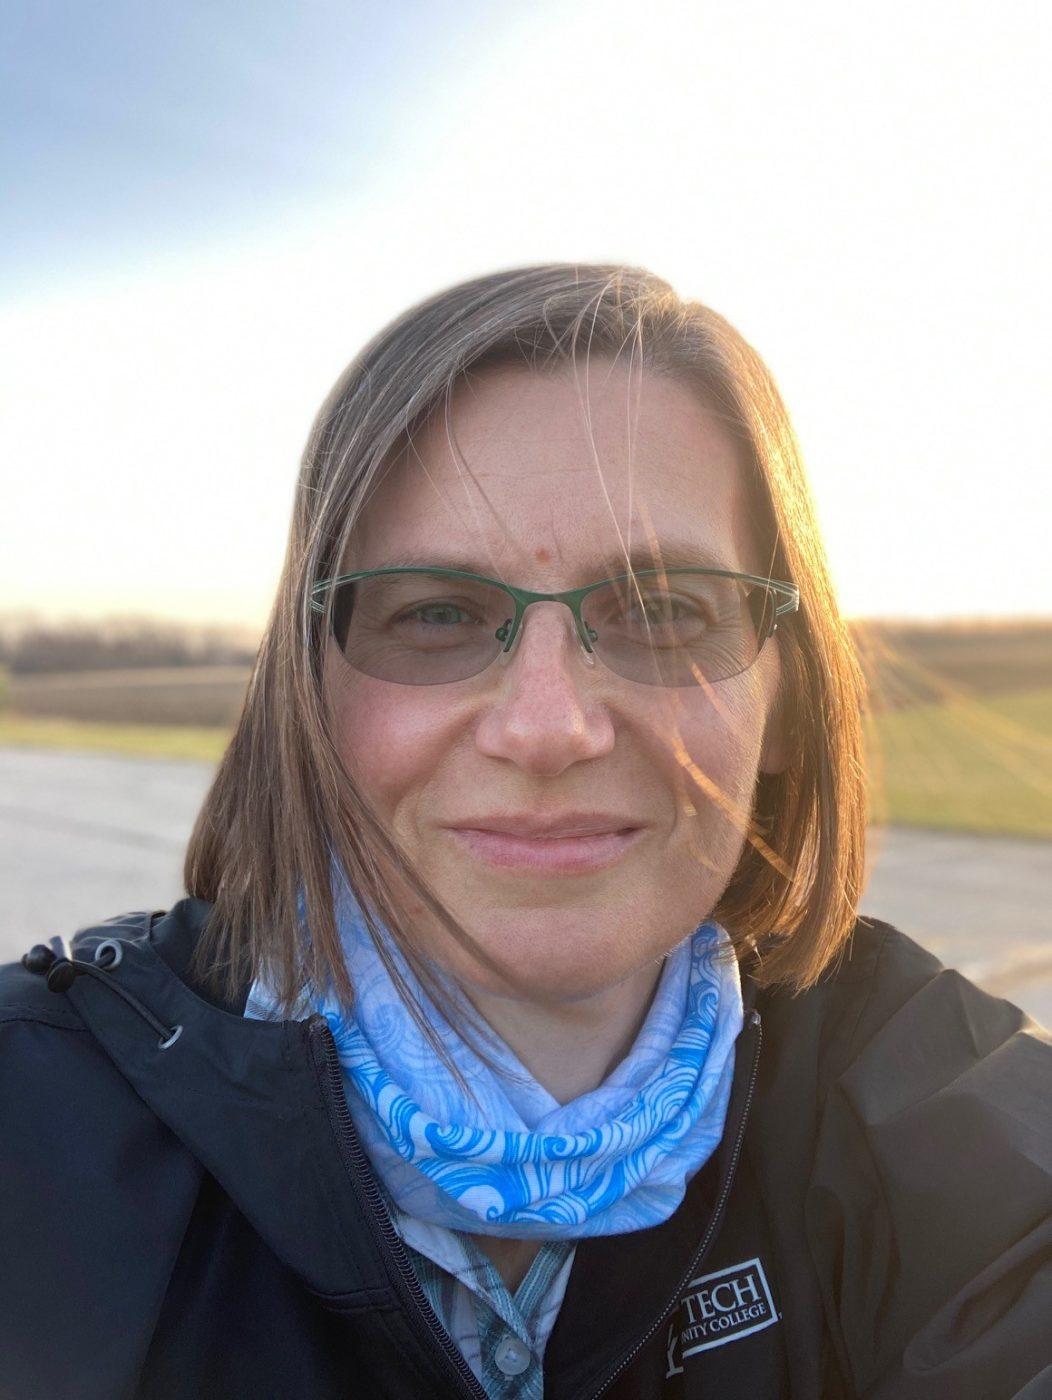 Carol Emmert, Recruitment and Volunteer Manager at Conner Prairie